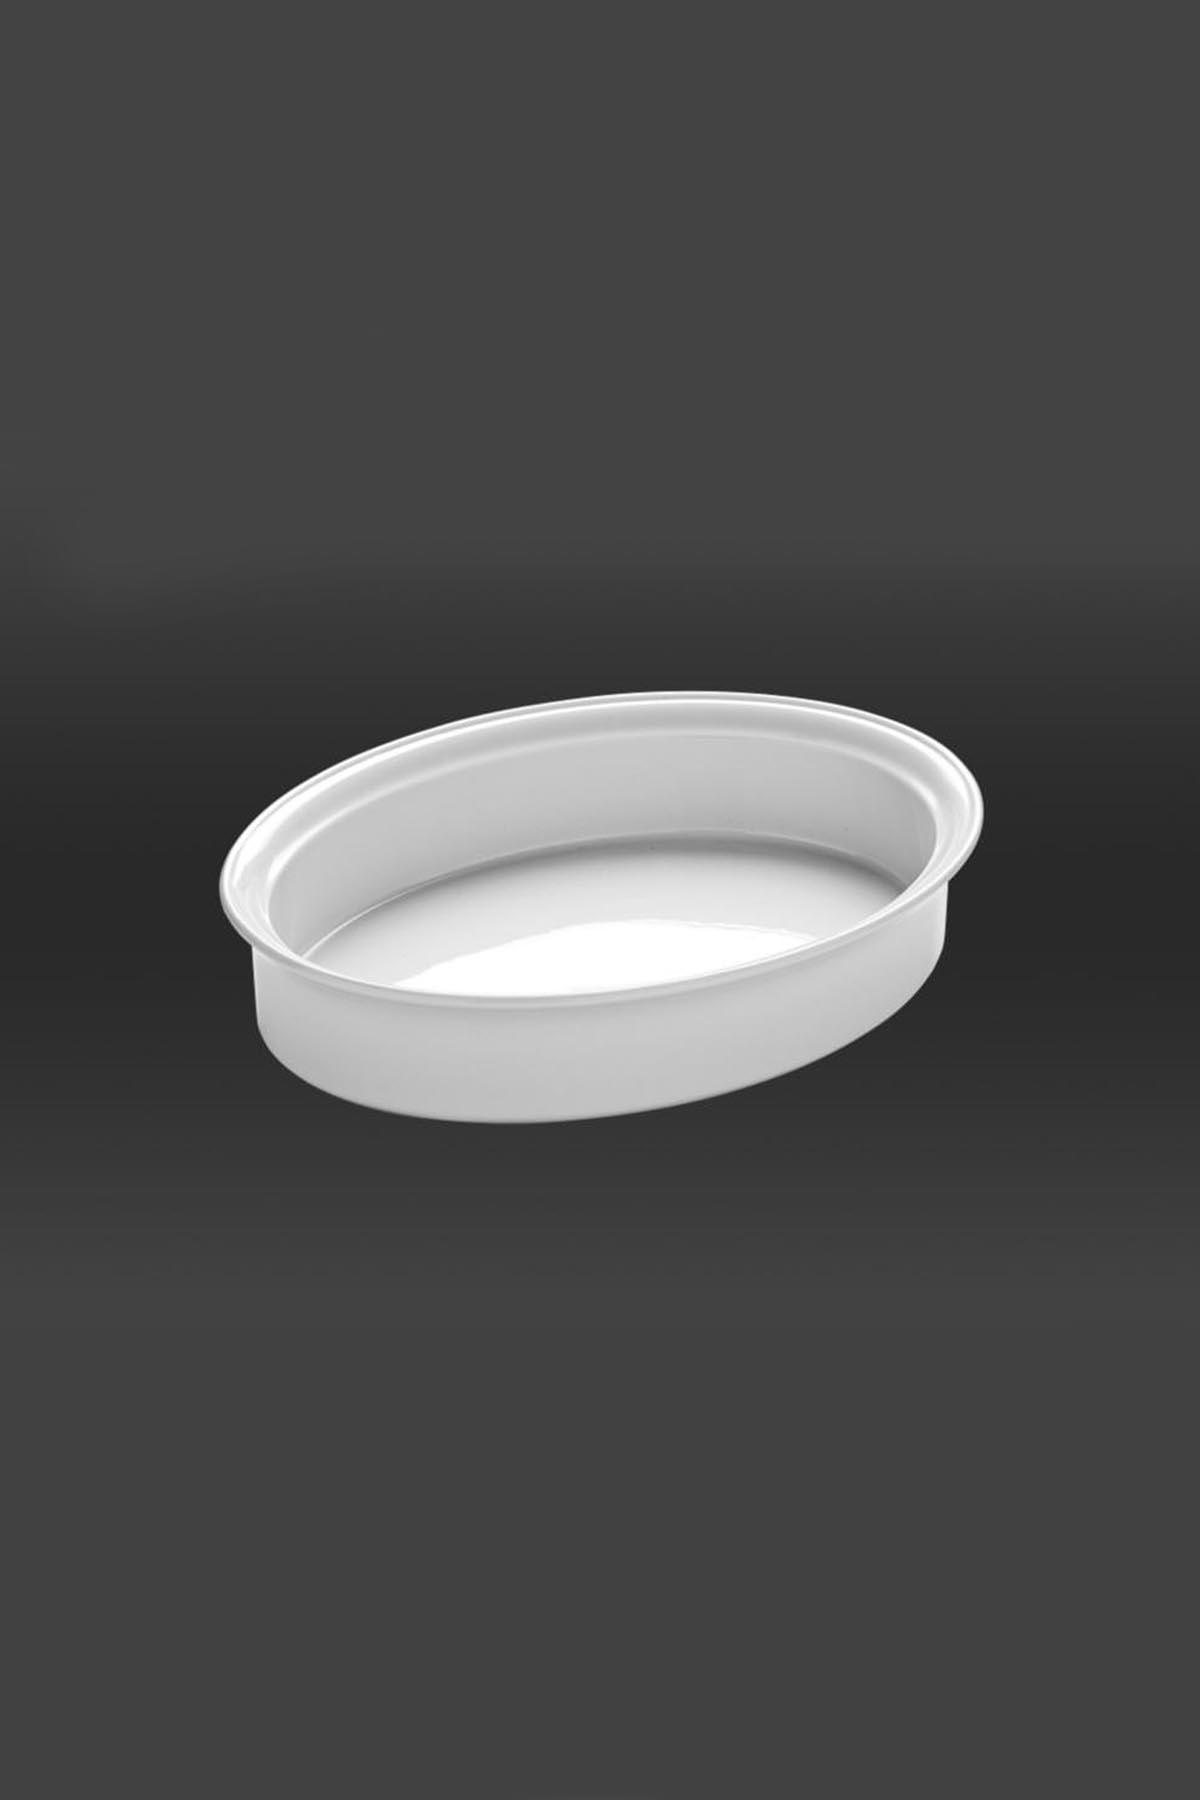 Kütahya Porselen Tavola 28 cm Firin Kabı Oval